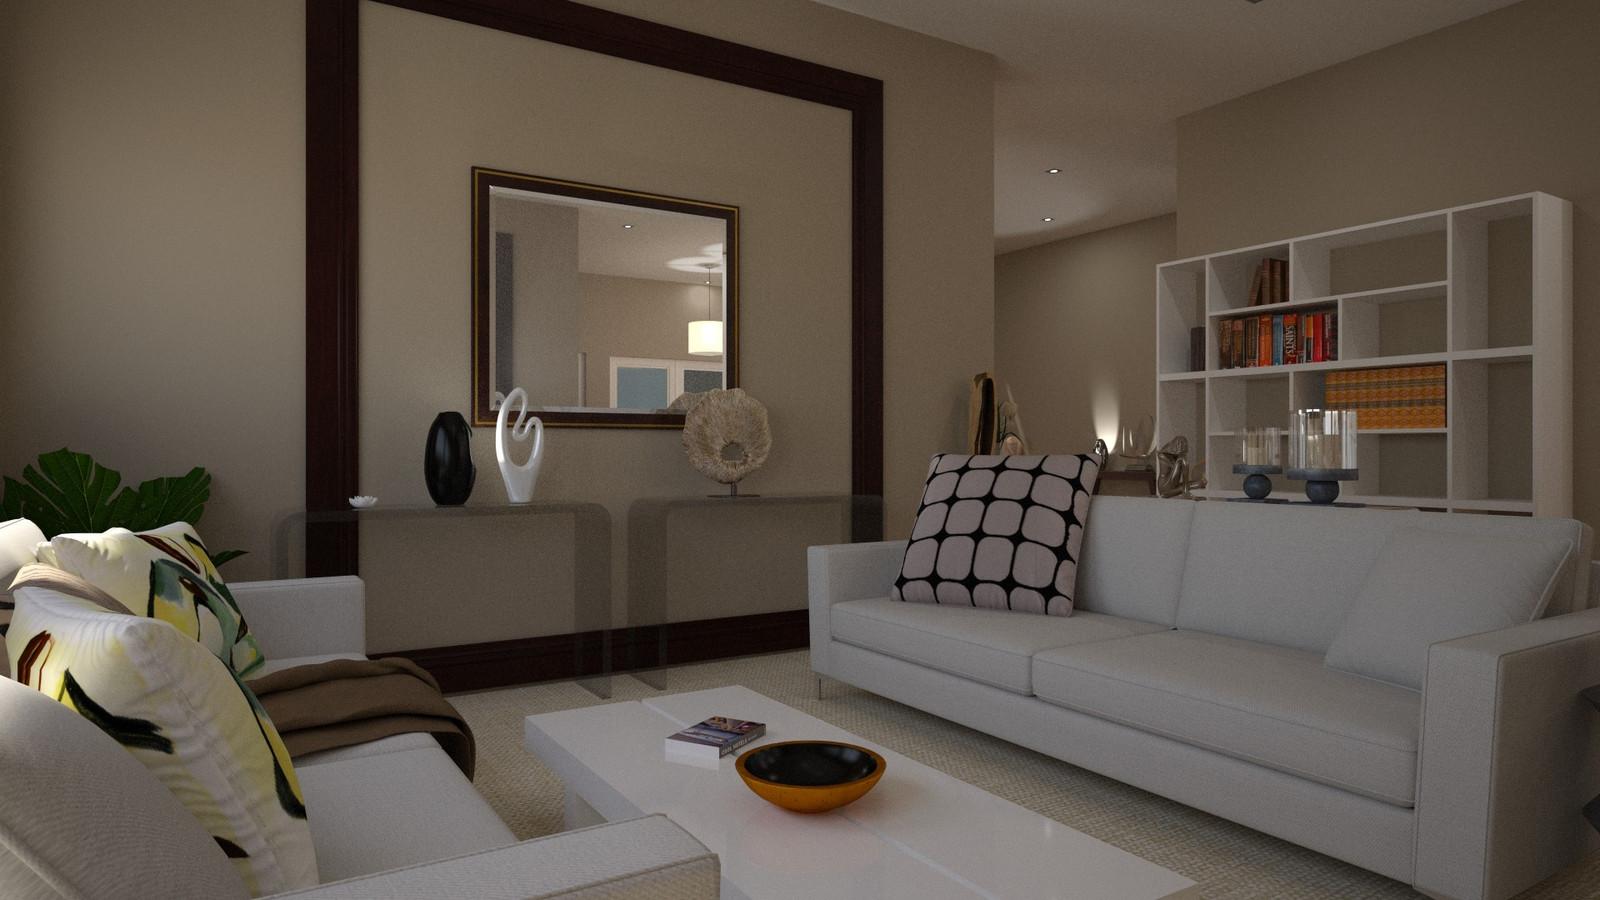 Online interior designers and interior designers in johannesburg